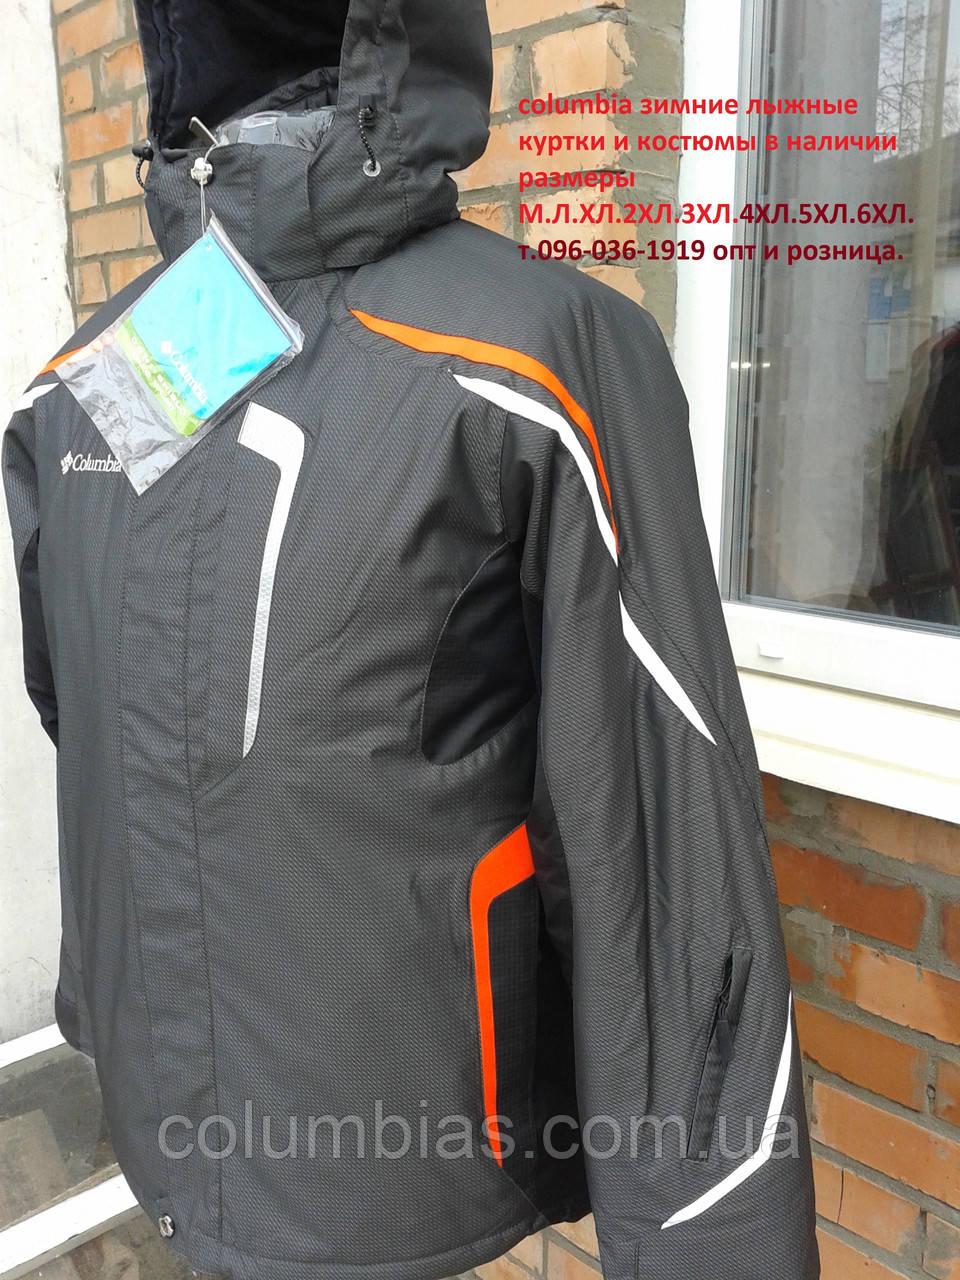 Баталы Columbua лыжные куртки